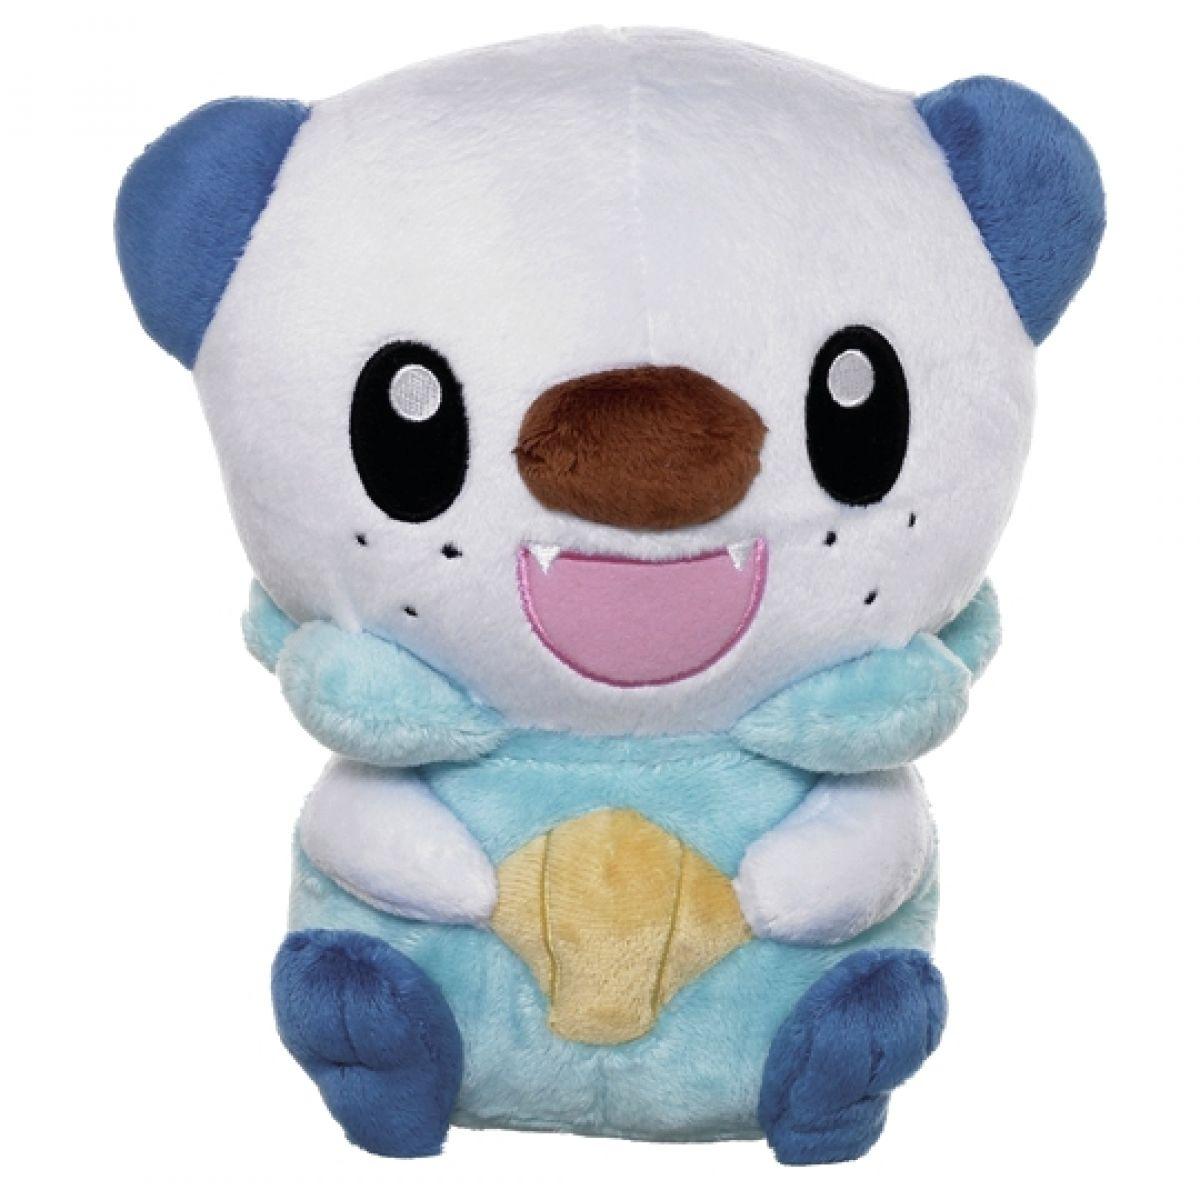 Pokémon Mluvící postavička 40cm - Oshawott